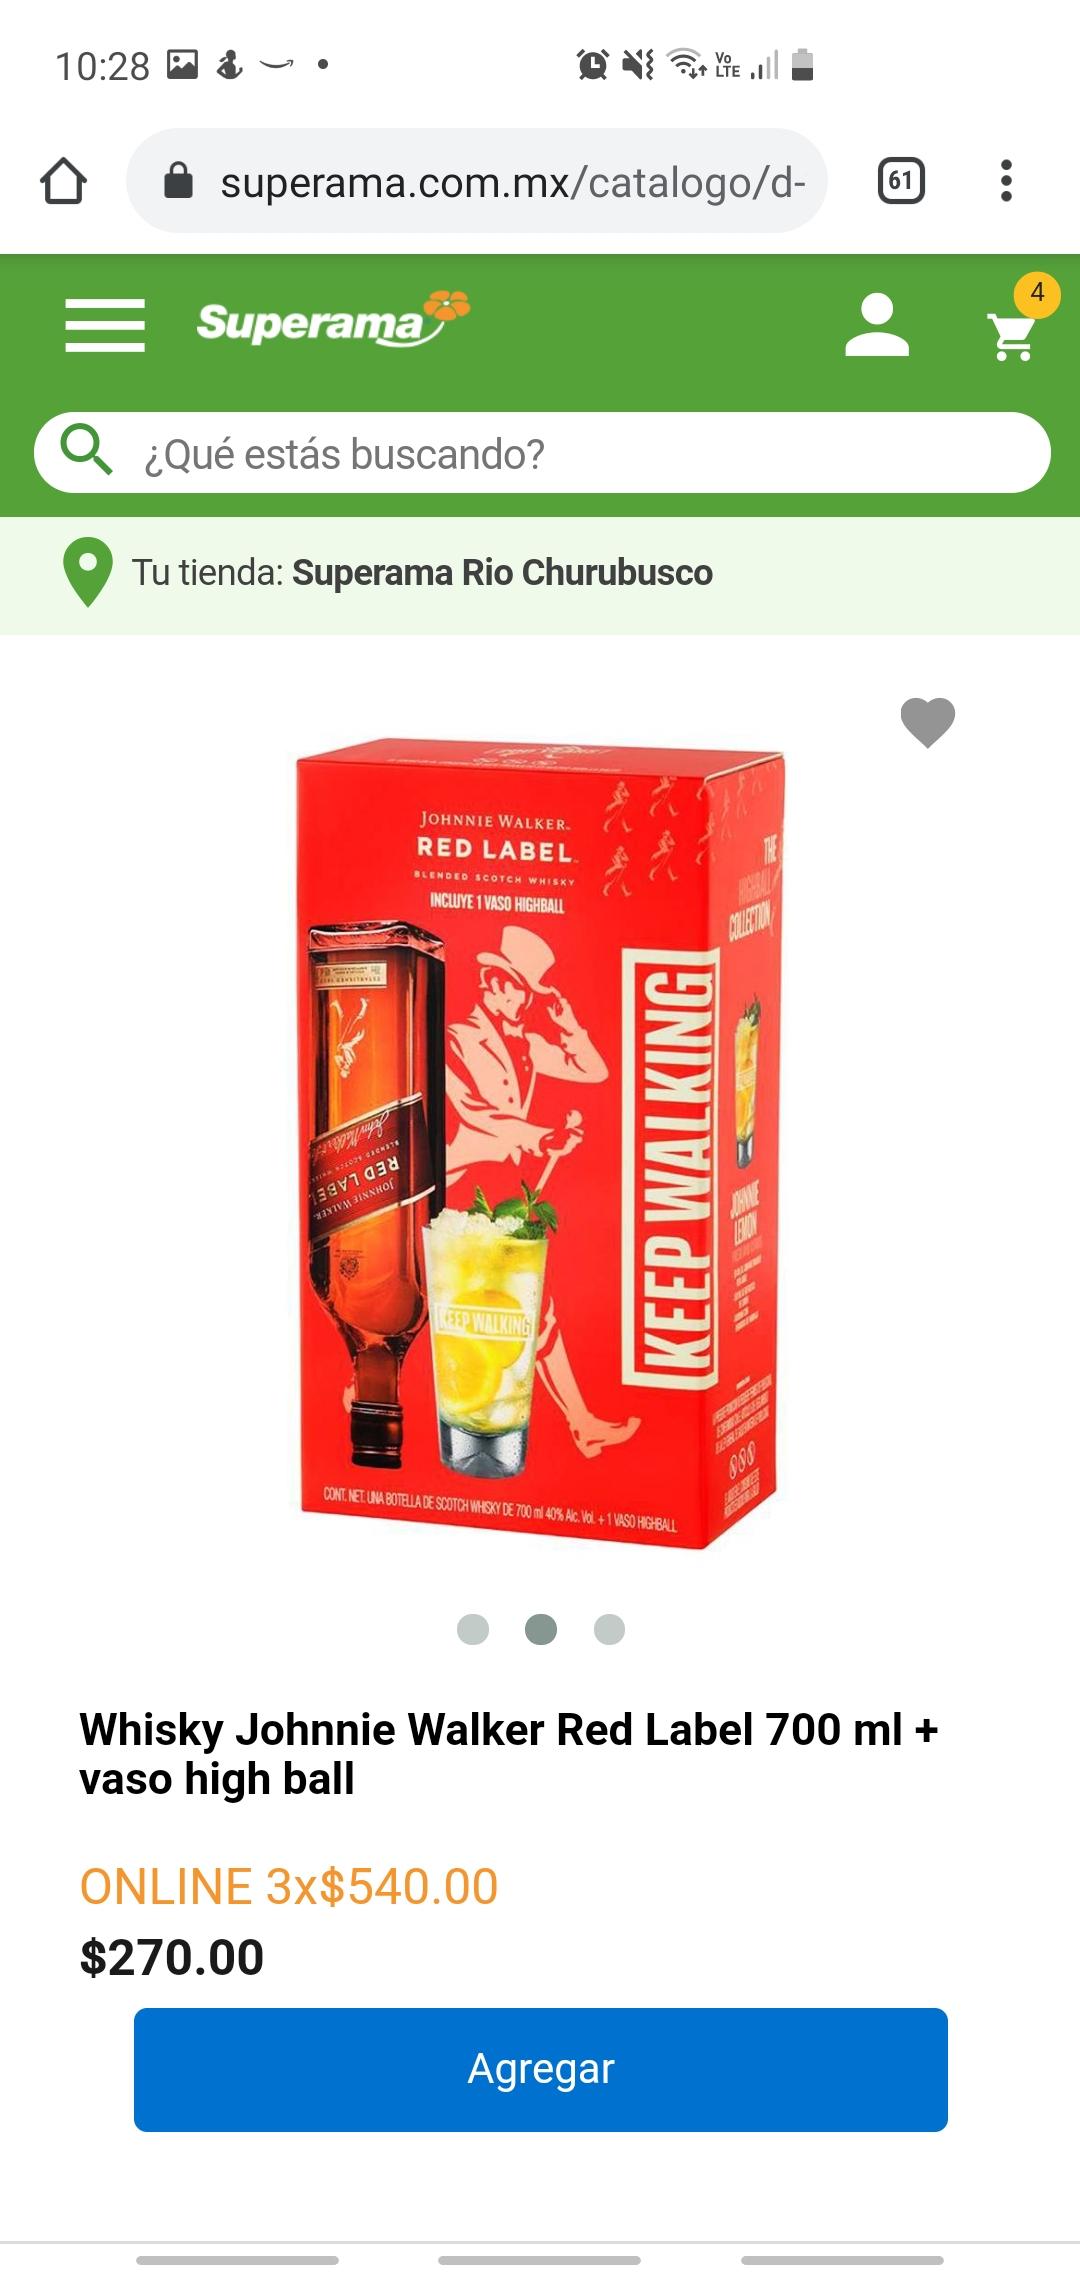 Superama.com: 3x2 Pack Whisky Red Label 700ml + Vaso HighBall ($180 cada pack)